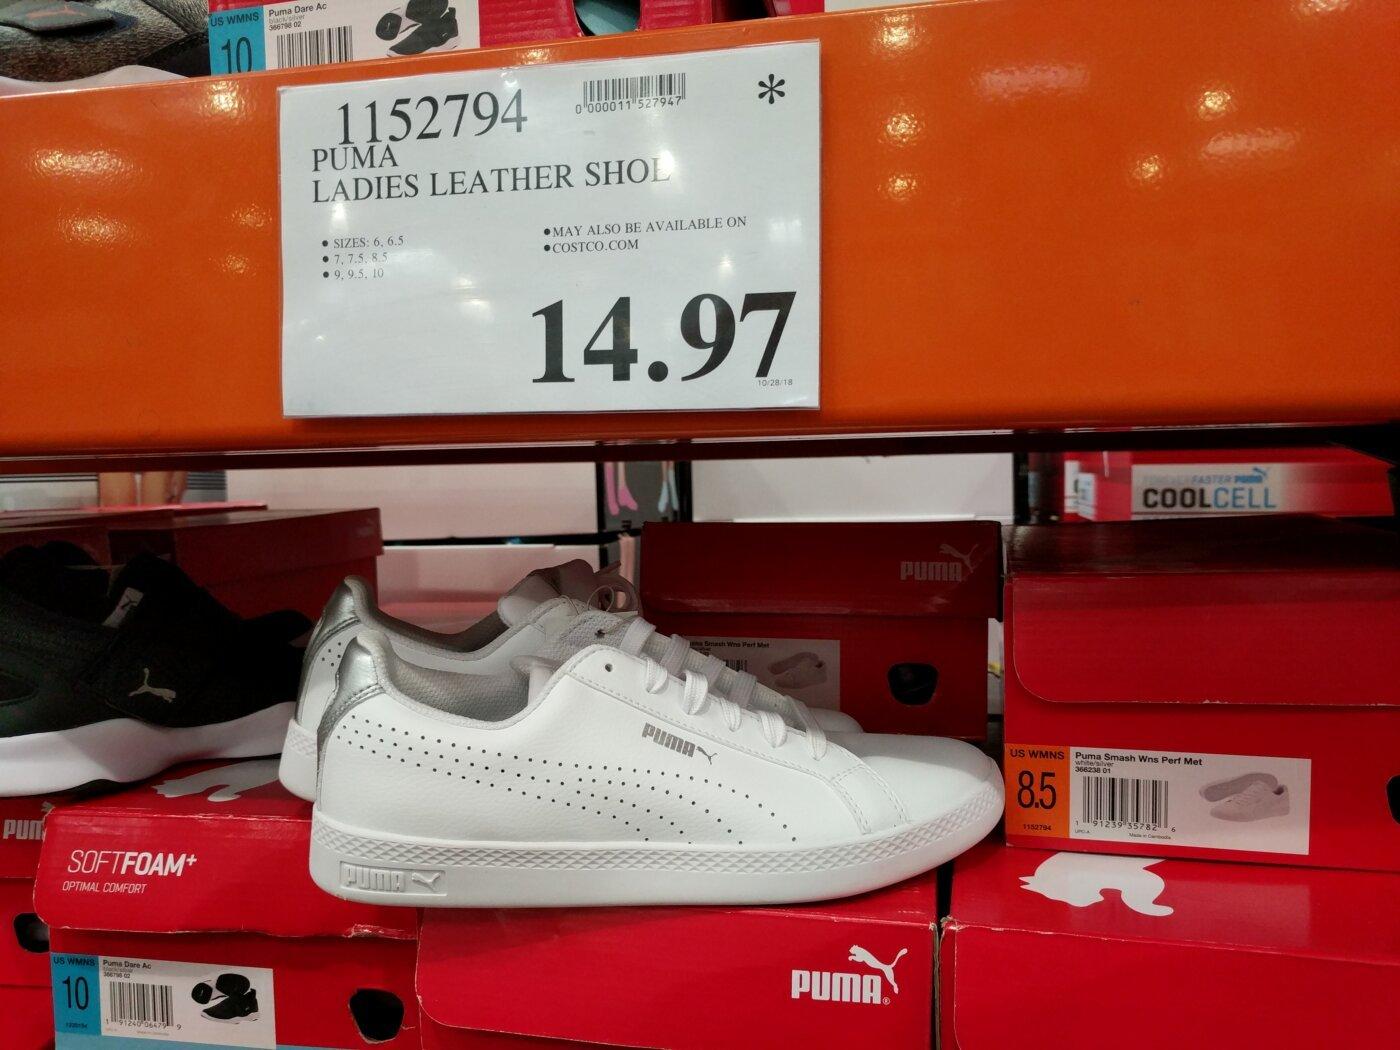 ef80c8a9afc3 Puma Ladies Leather Shoe